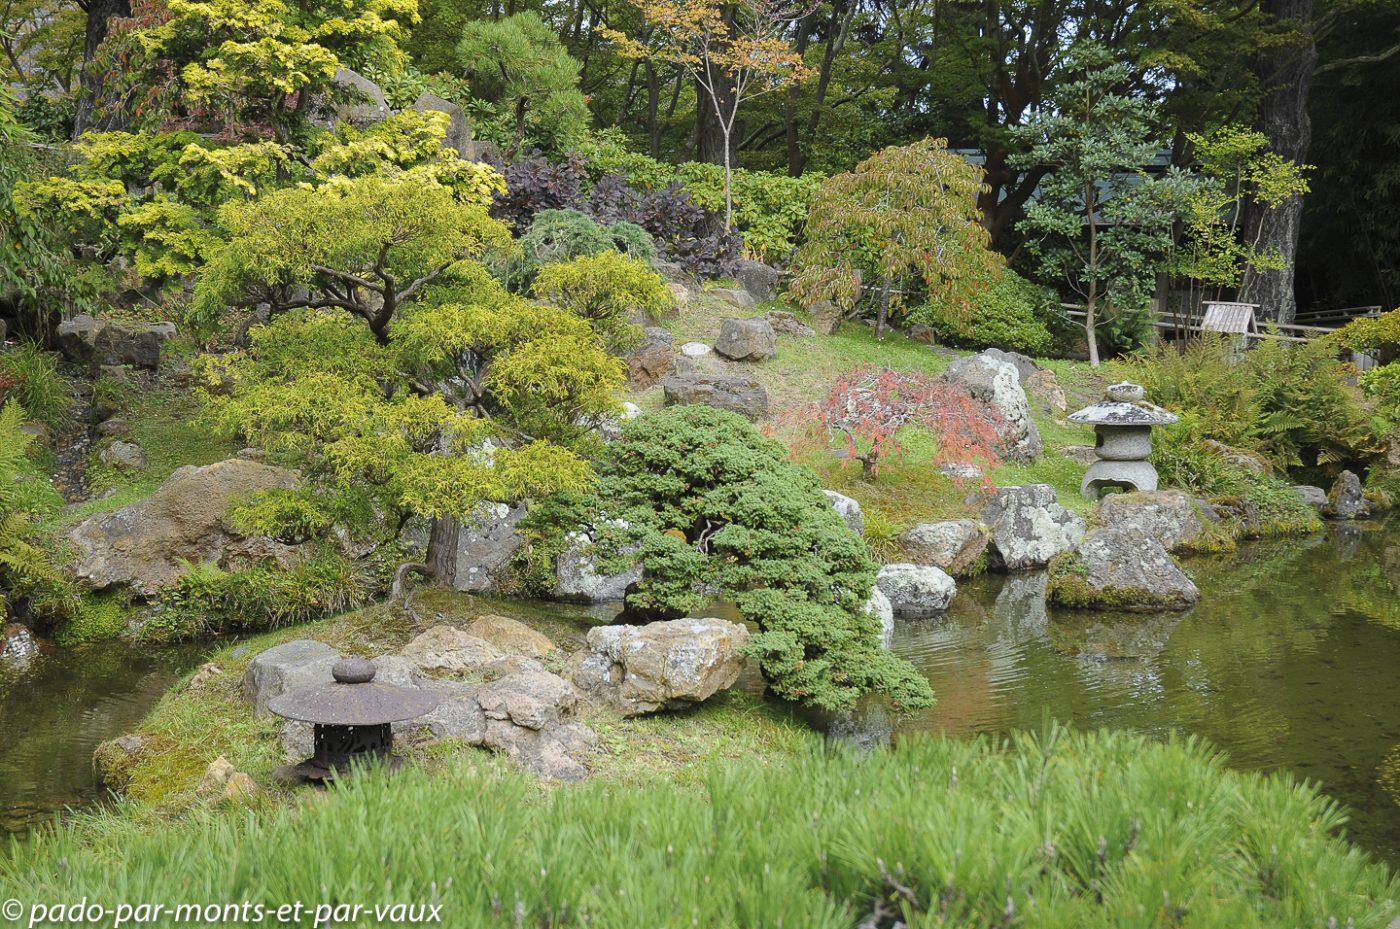 2009 Japanese tea garden